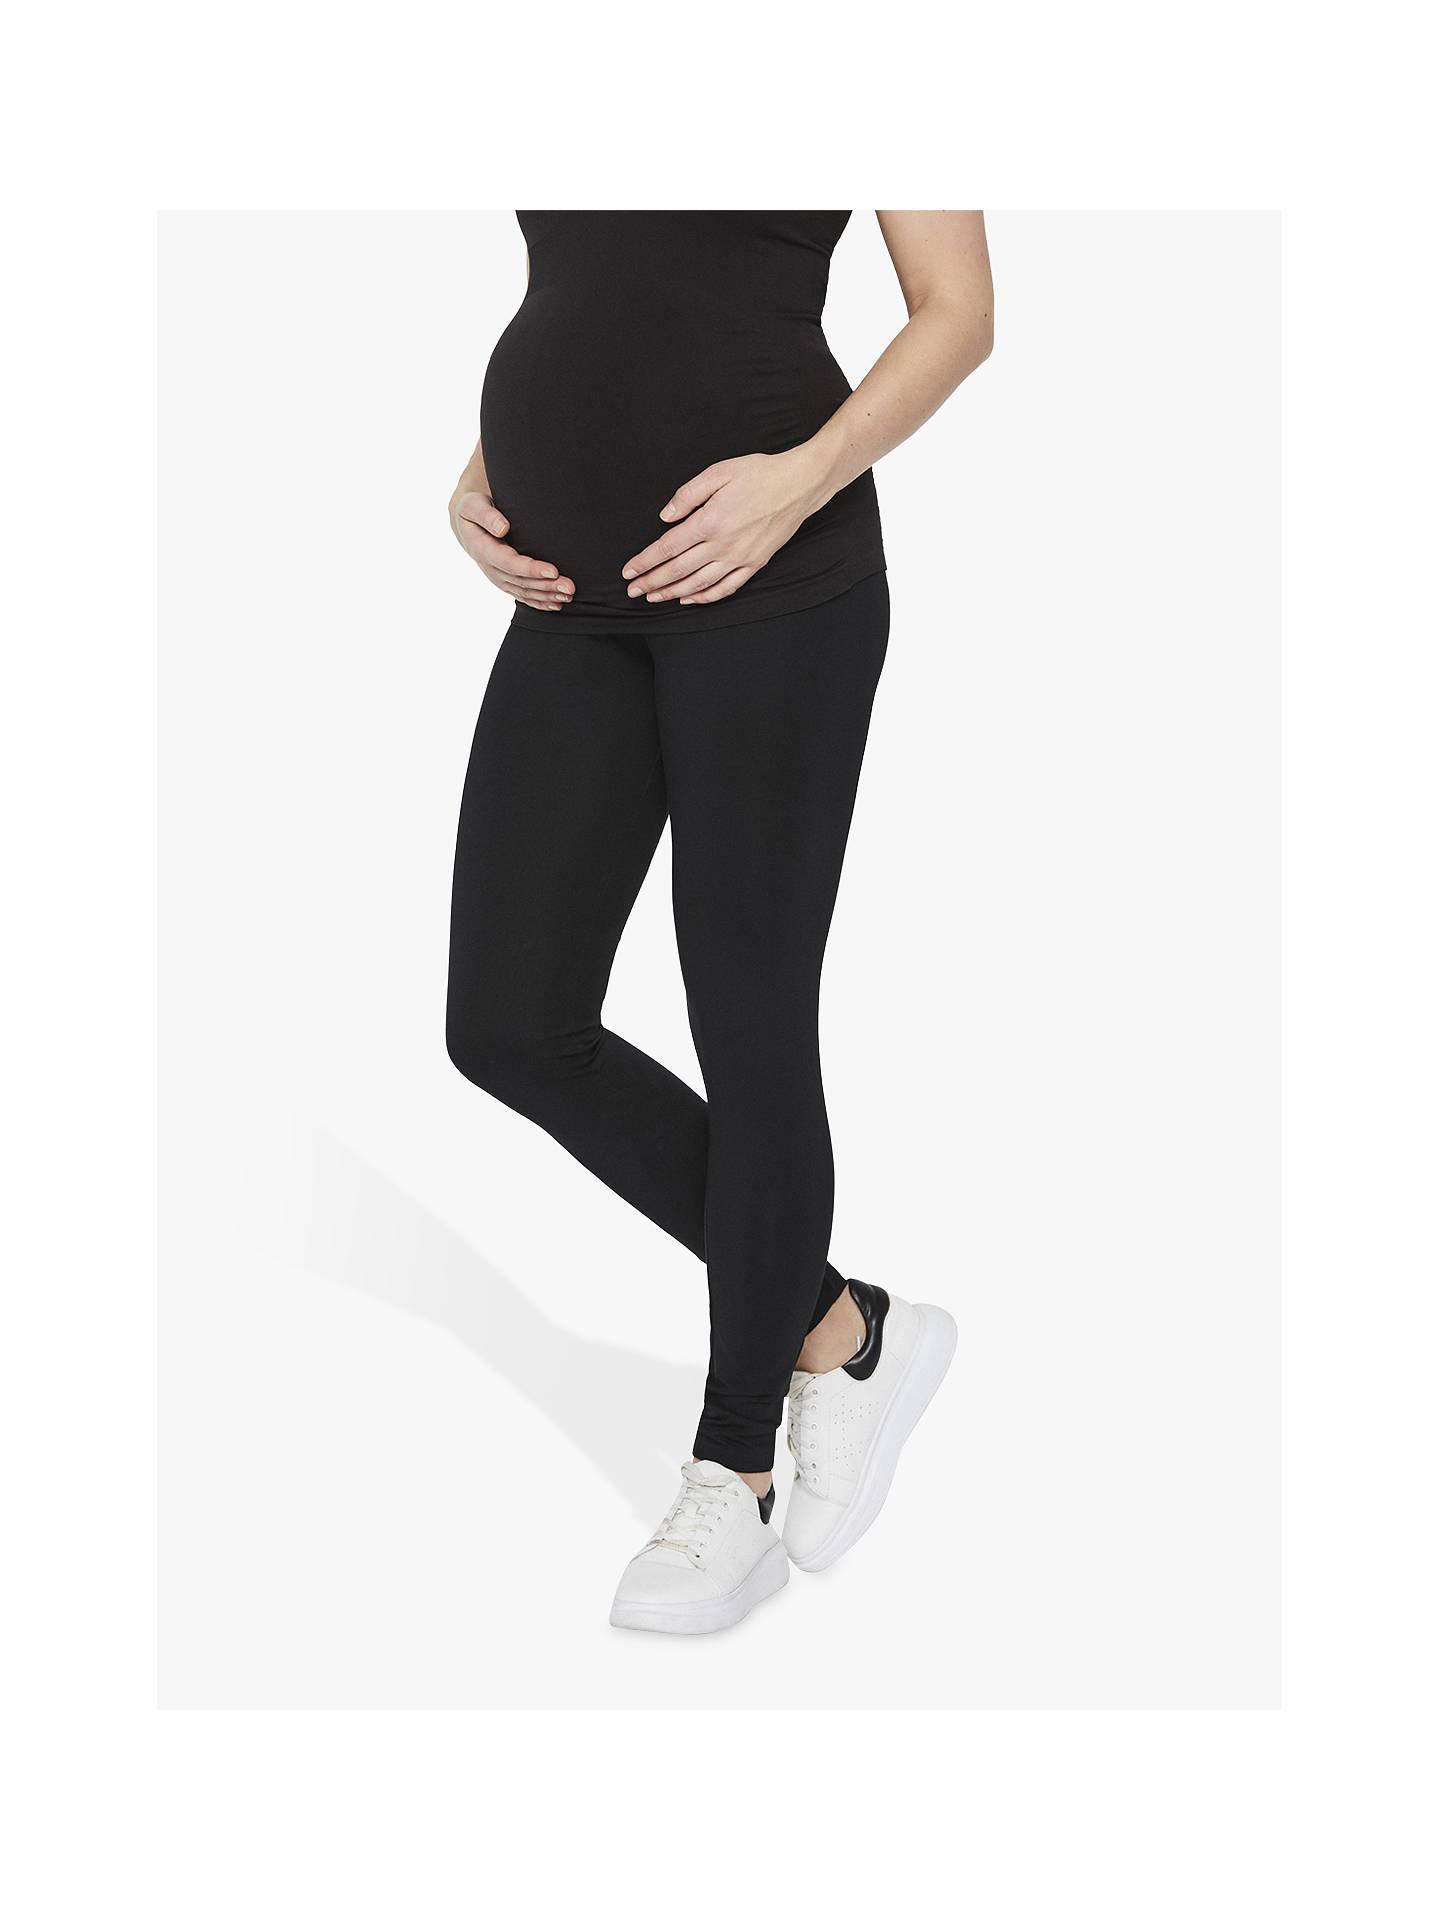 8ccd033a51b769 Buy Mamalicious Lea Organic Long Jersey Maternity Leggings, Pack of 2,  Black, S ...